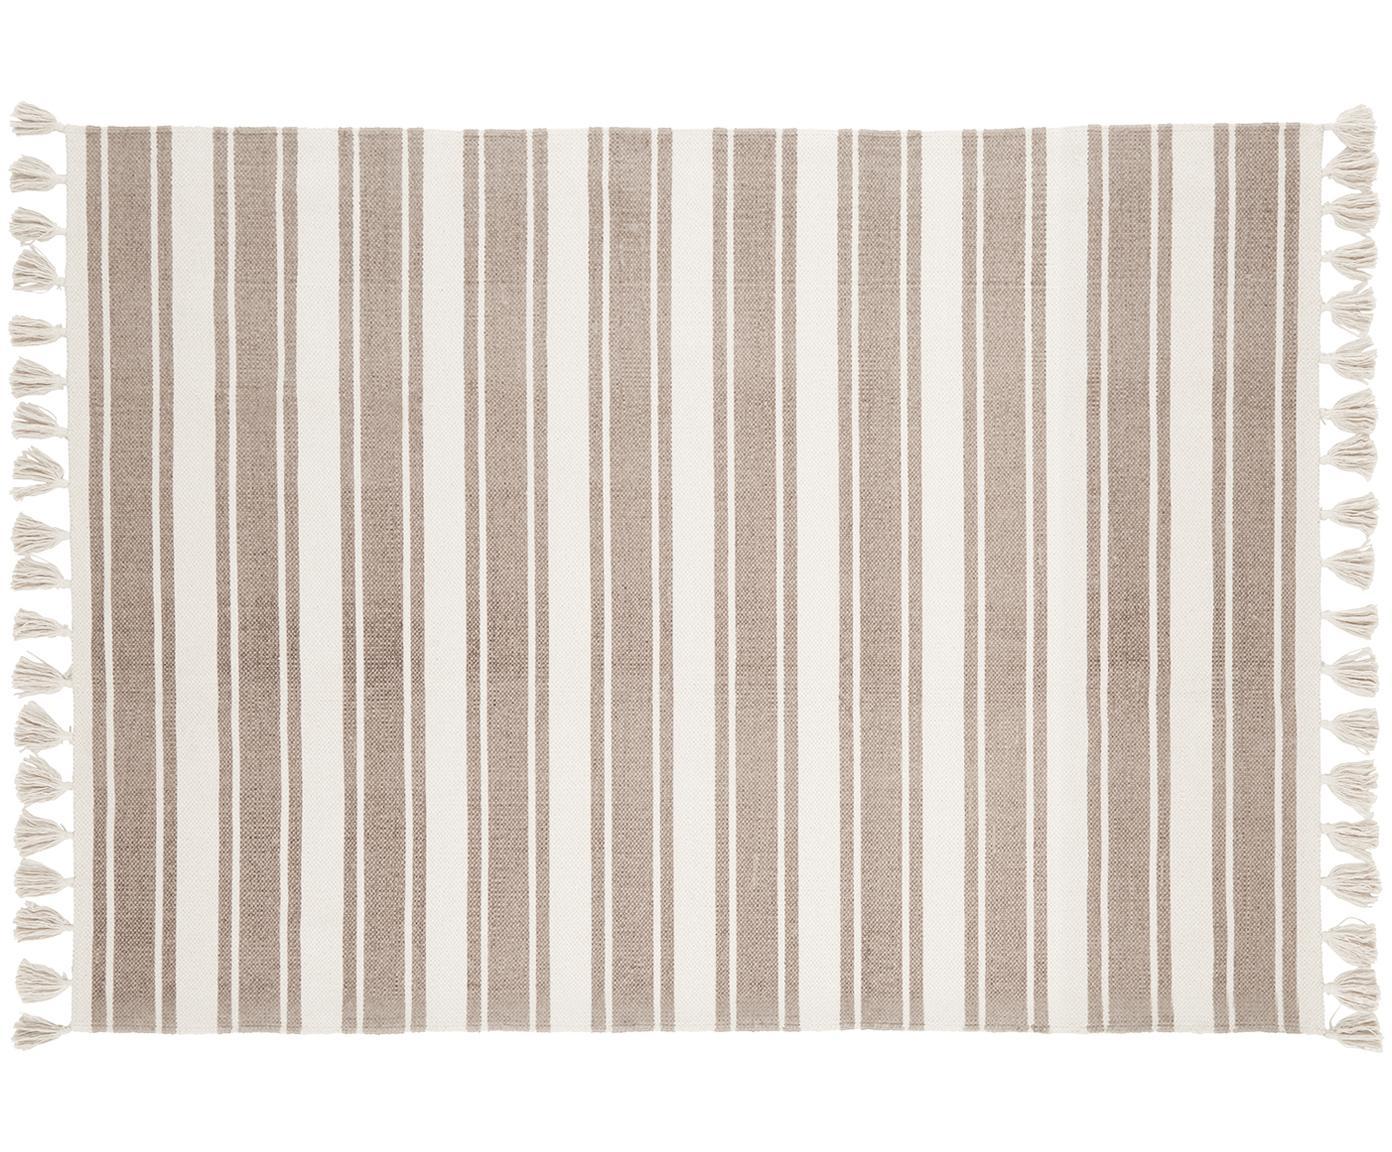 Alfombra artesanal de algodón Vigga, Gris pardo, beige, An 120 x L 180 cm (Tamaño S)